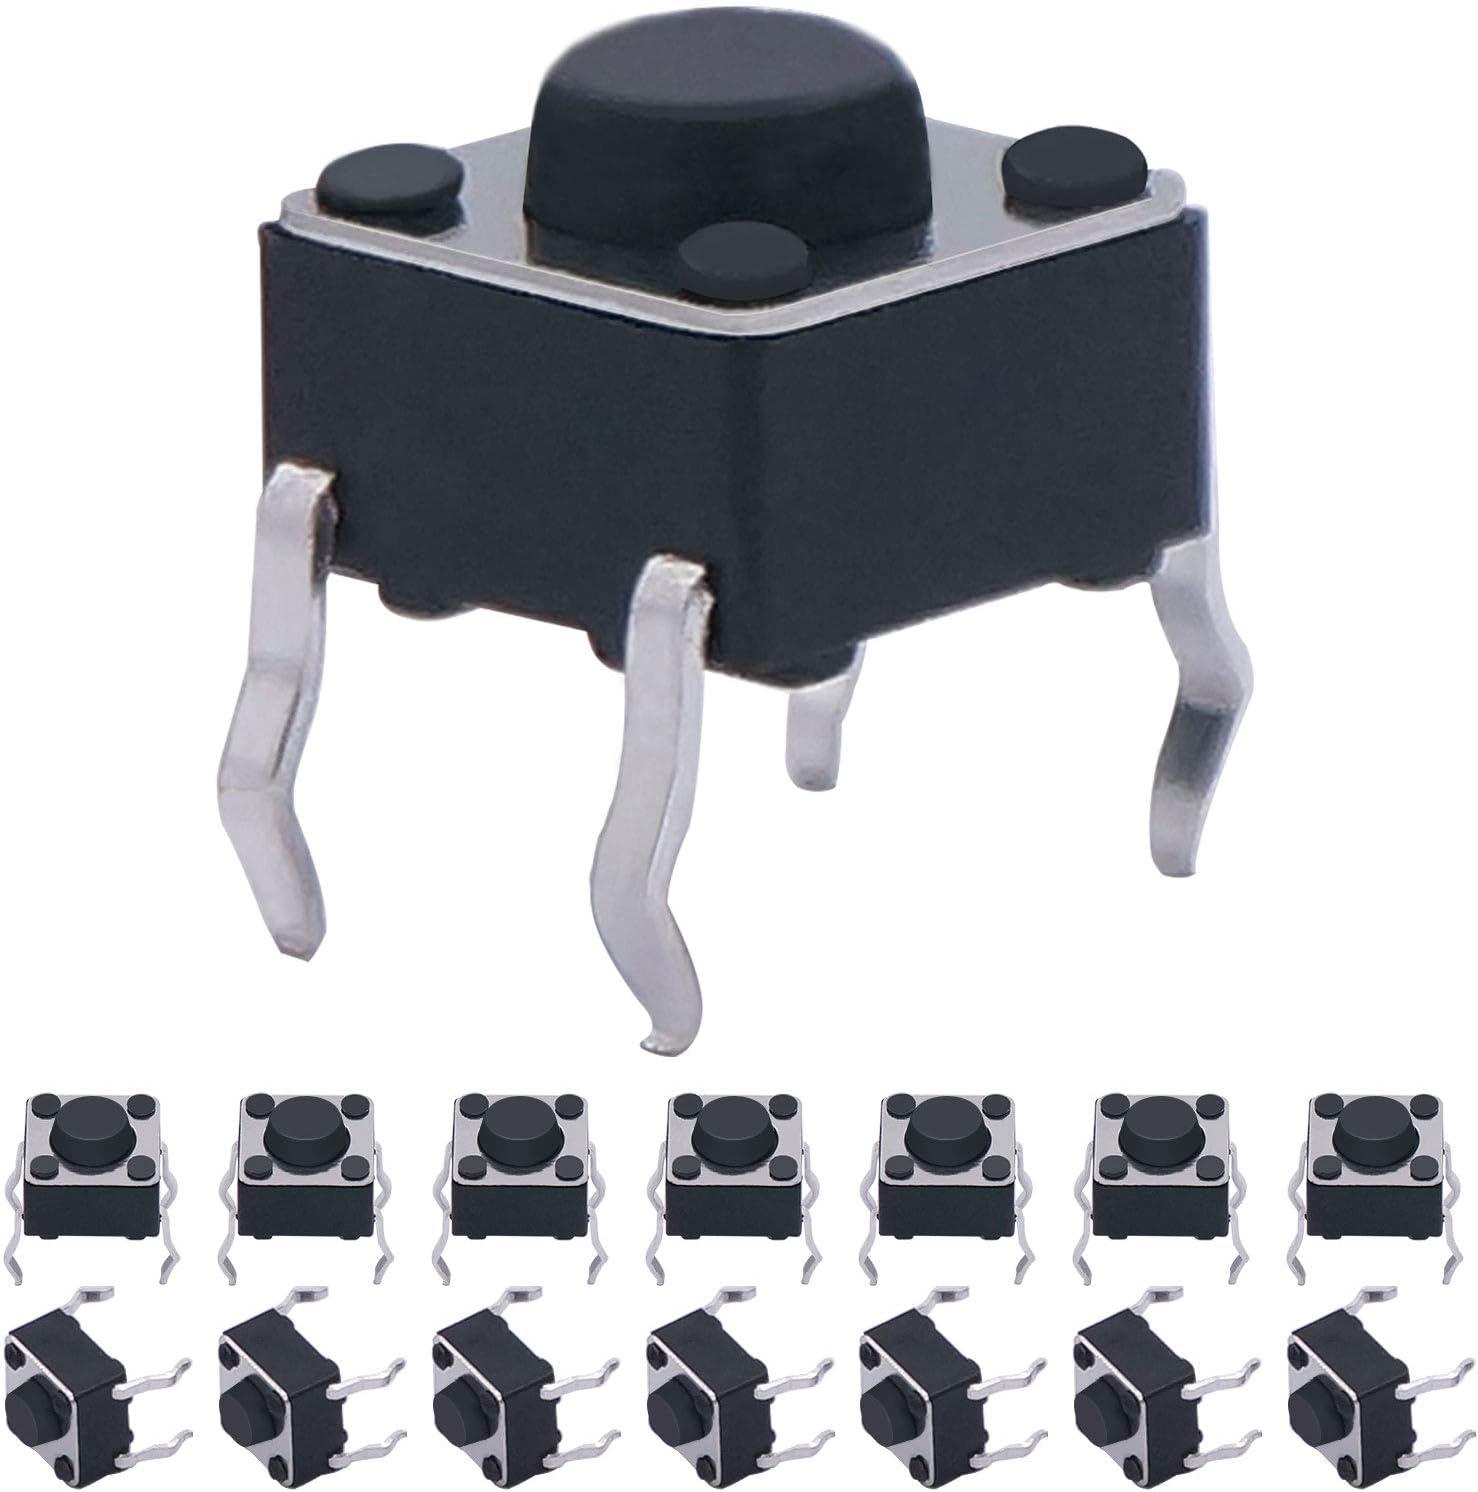 New item Taiss 100 Pcs 6 x 6mm 5mm Push Tactile PCB Momentary NEW Tact Butt